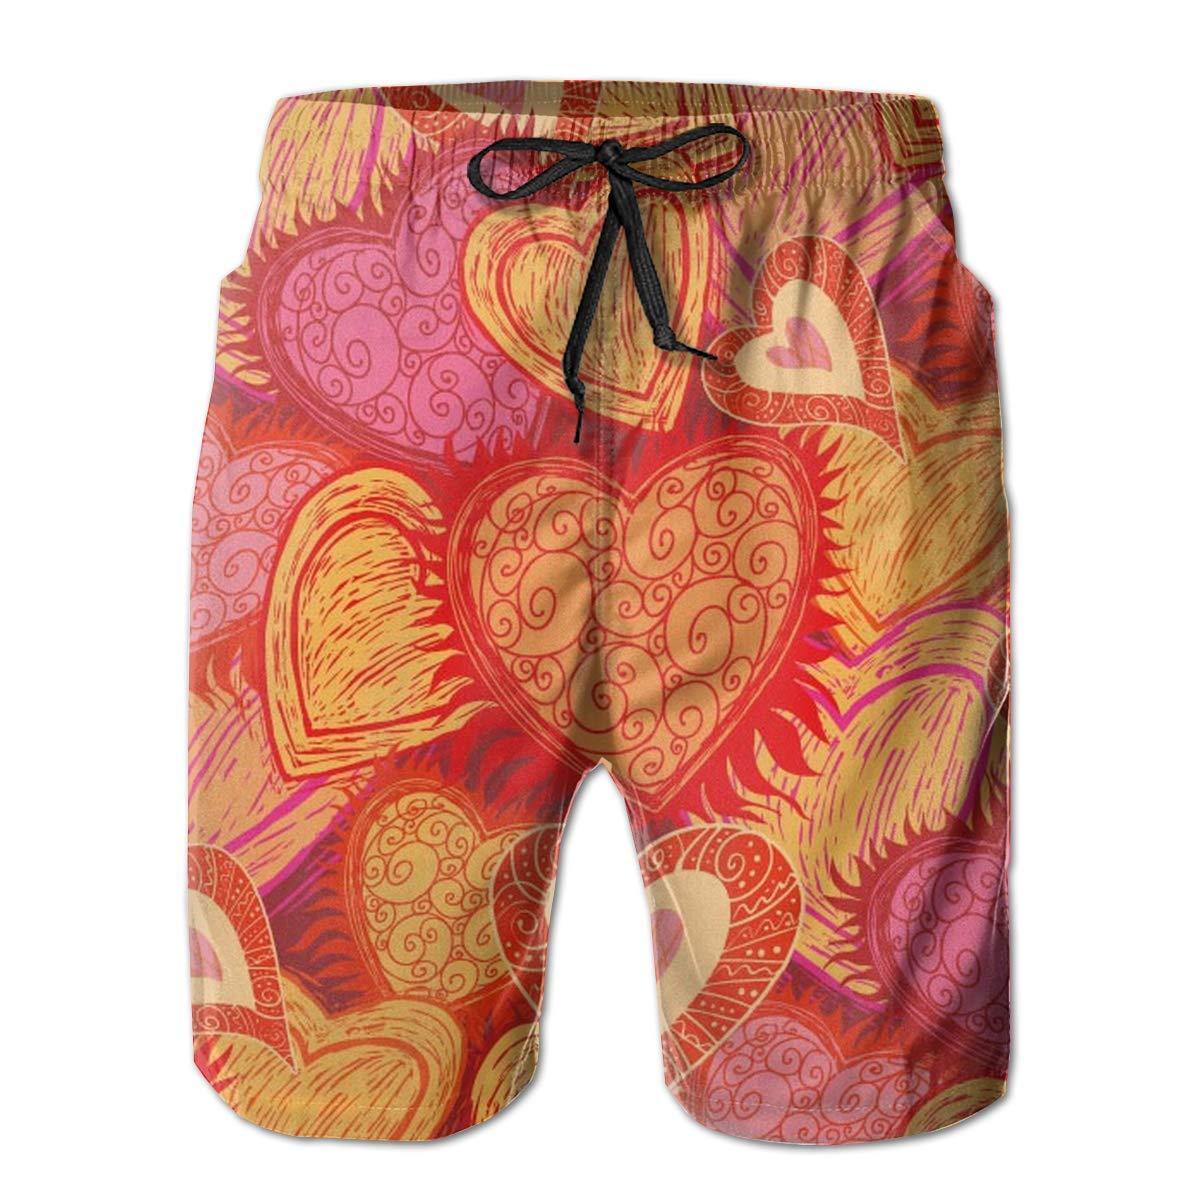 Love Hearts Flower Comfort Men /& Boys Big /& Tall Cargo Short Board Shorts for Beach Outdoor Workout